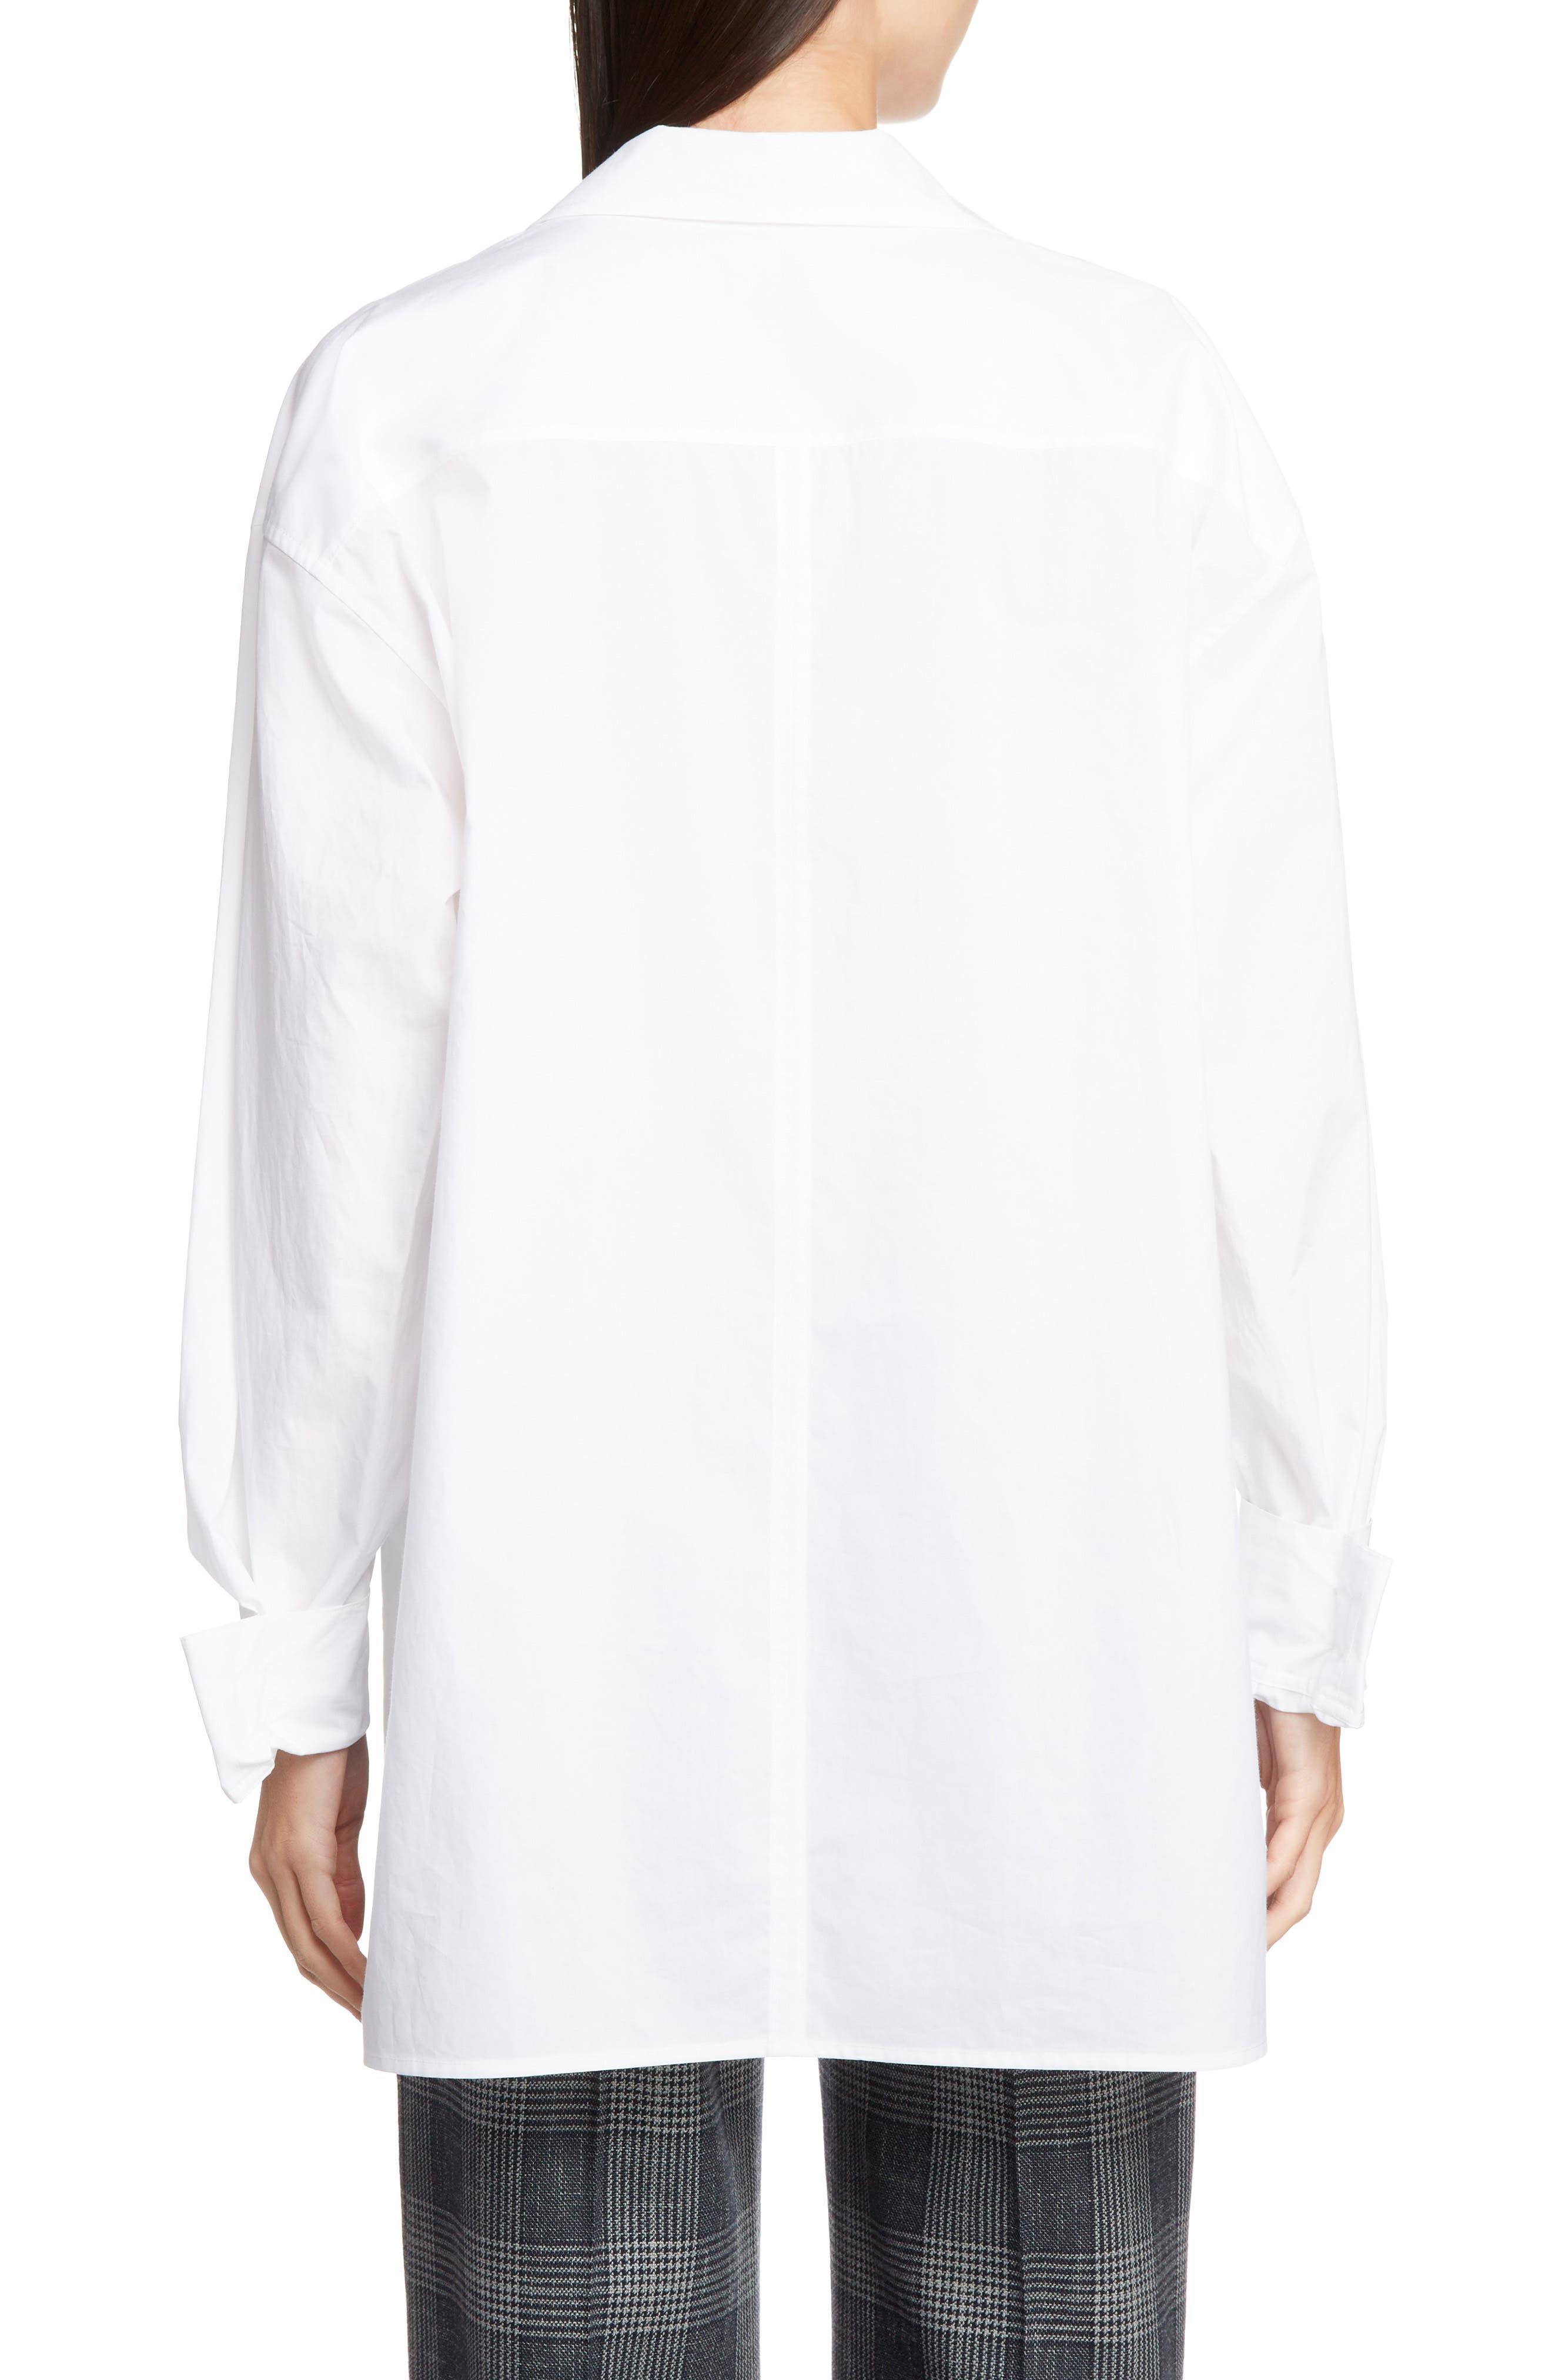 ACNE STUDIOS,                             Spread Collar Shirt,                             Alternate thumbnail 2, color,                             WHITE